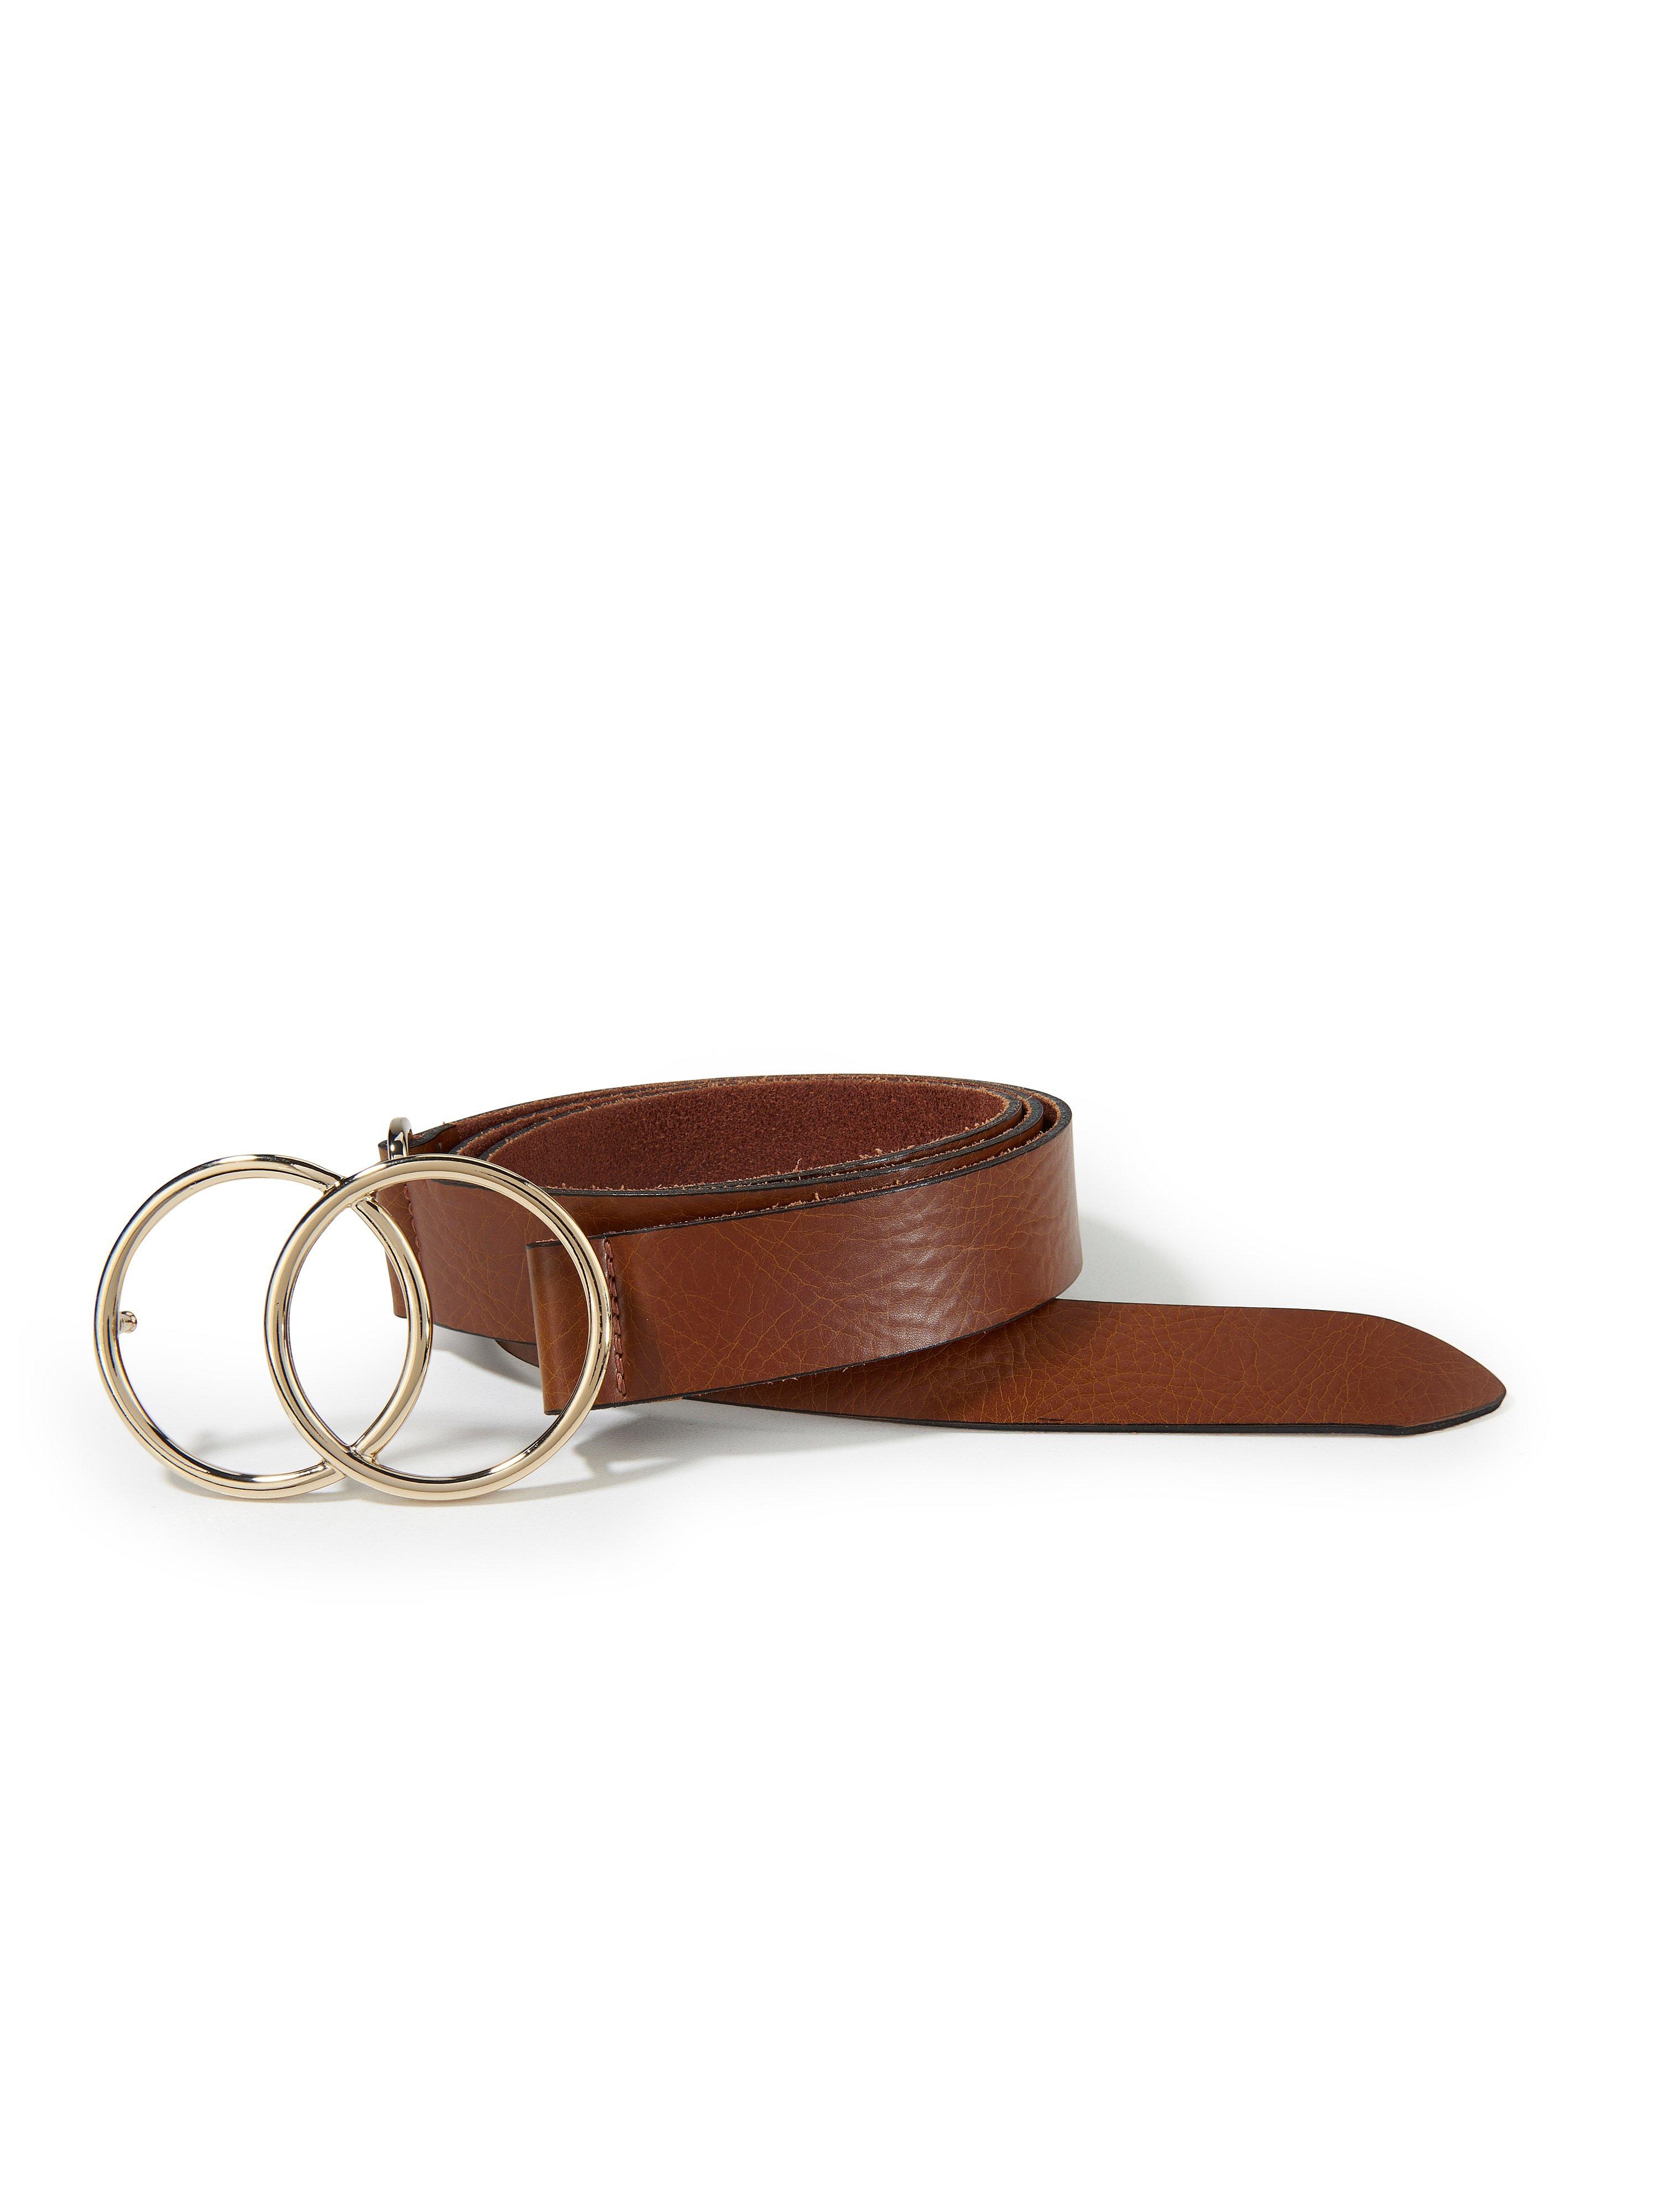 La ceinture 100% cuir  MYBC marron taille 95